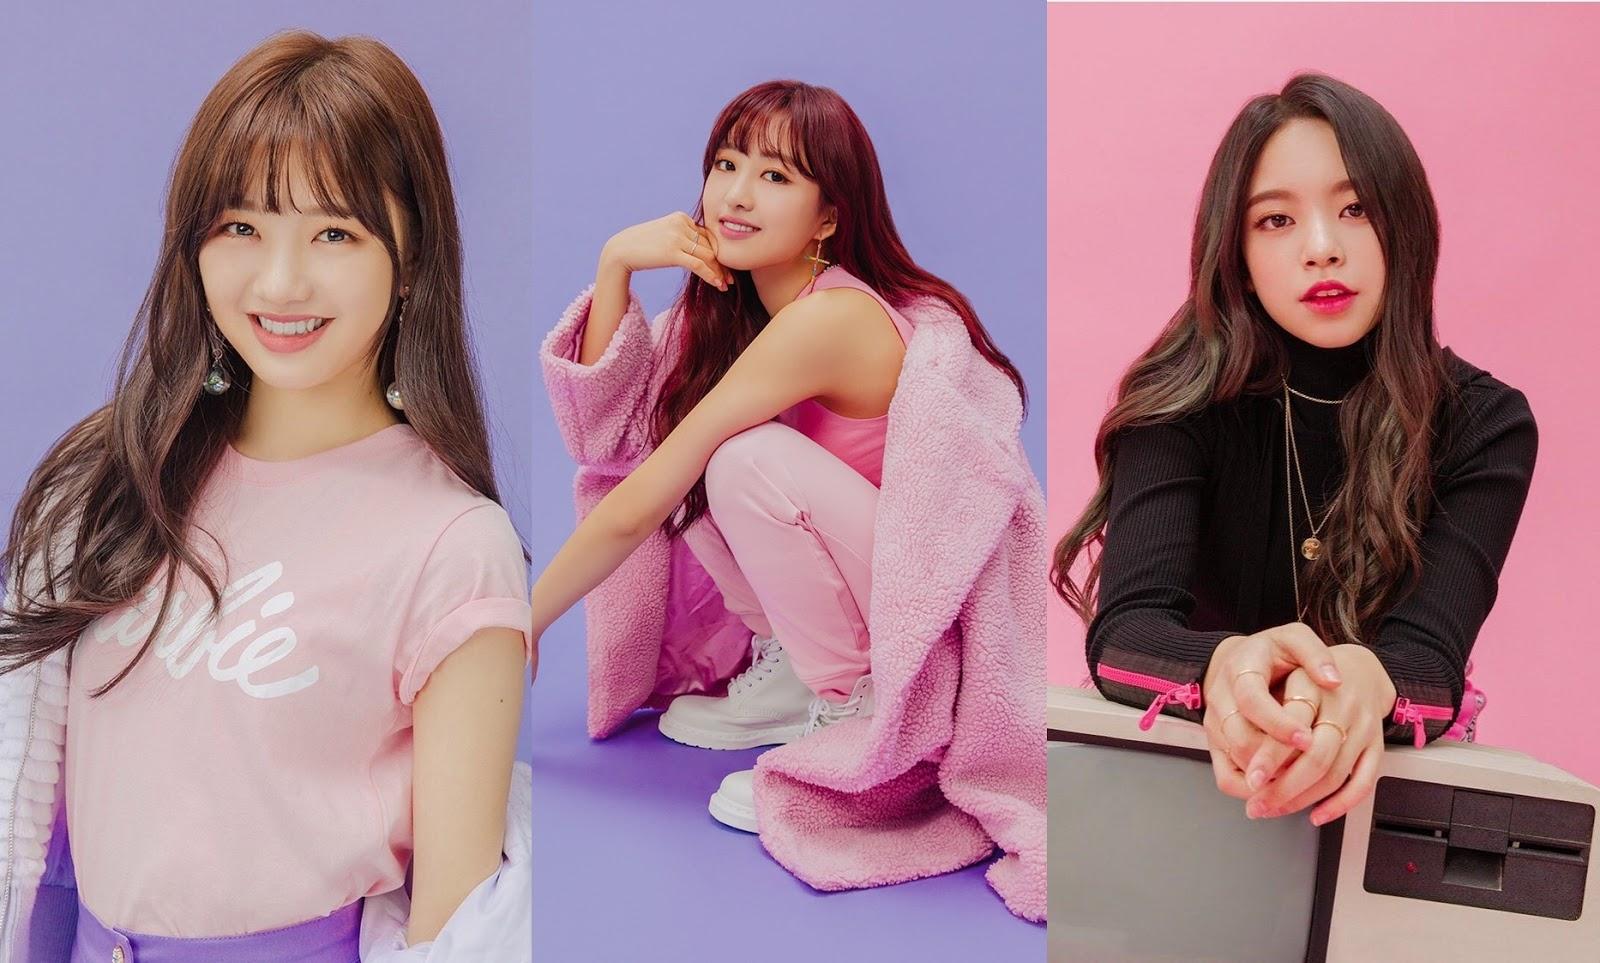 Kokoro, Mirae and LinLin Officially Left Cherry Bullet